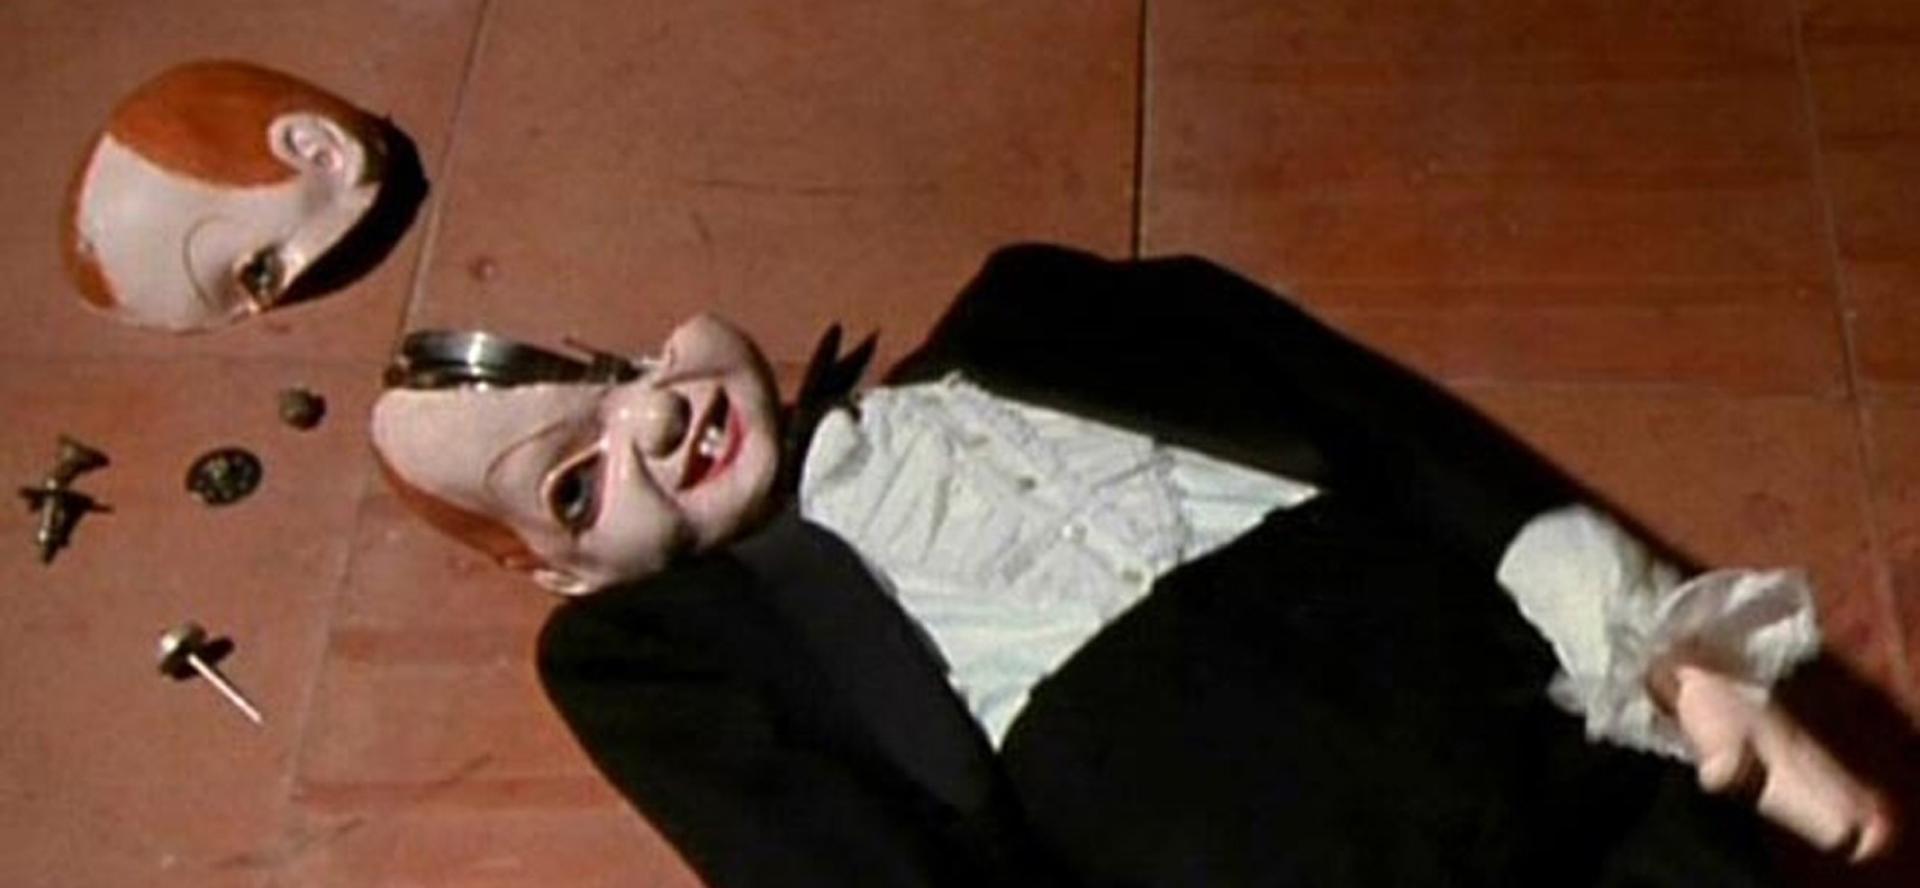 Mélyvörös - Profondo Rosso (1975) 2. kép